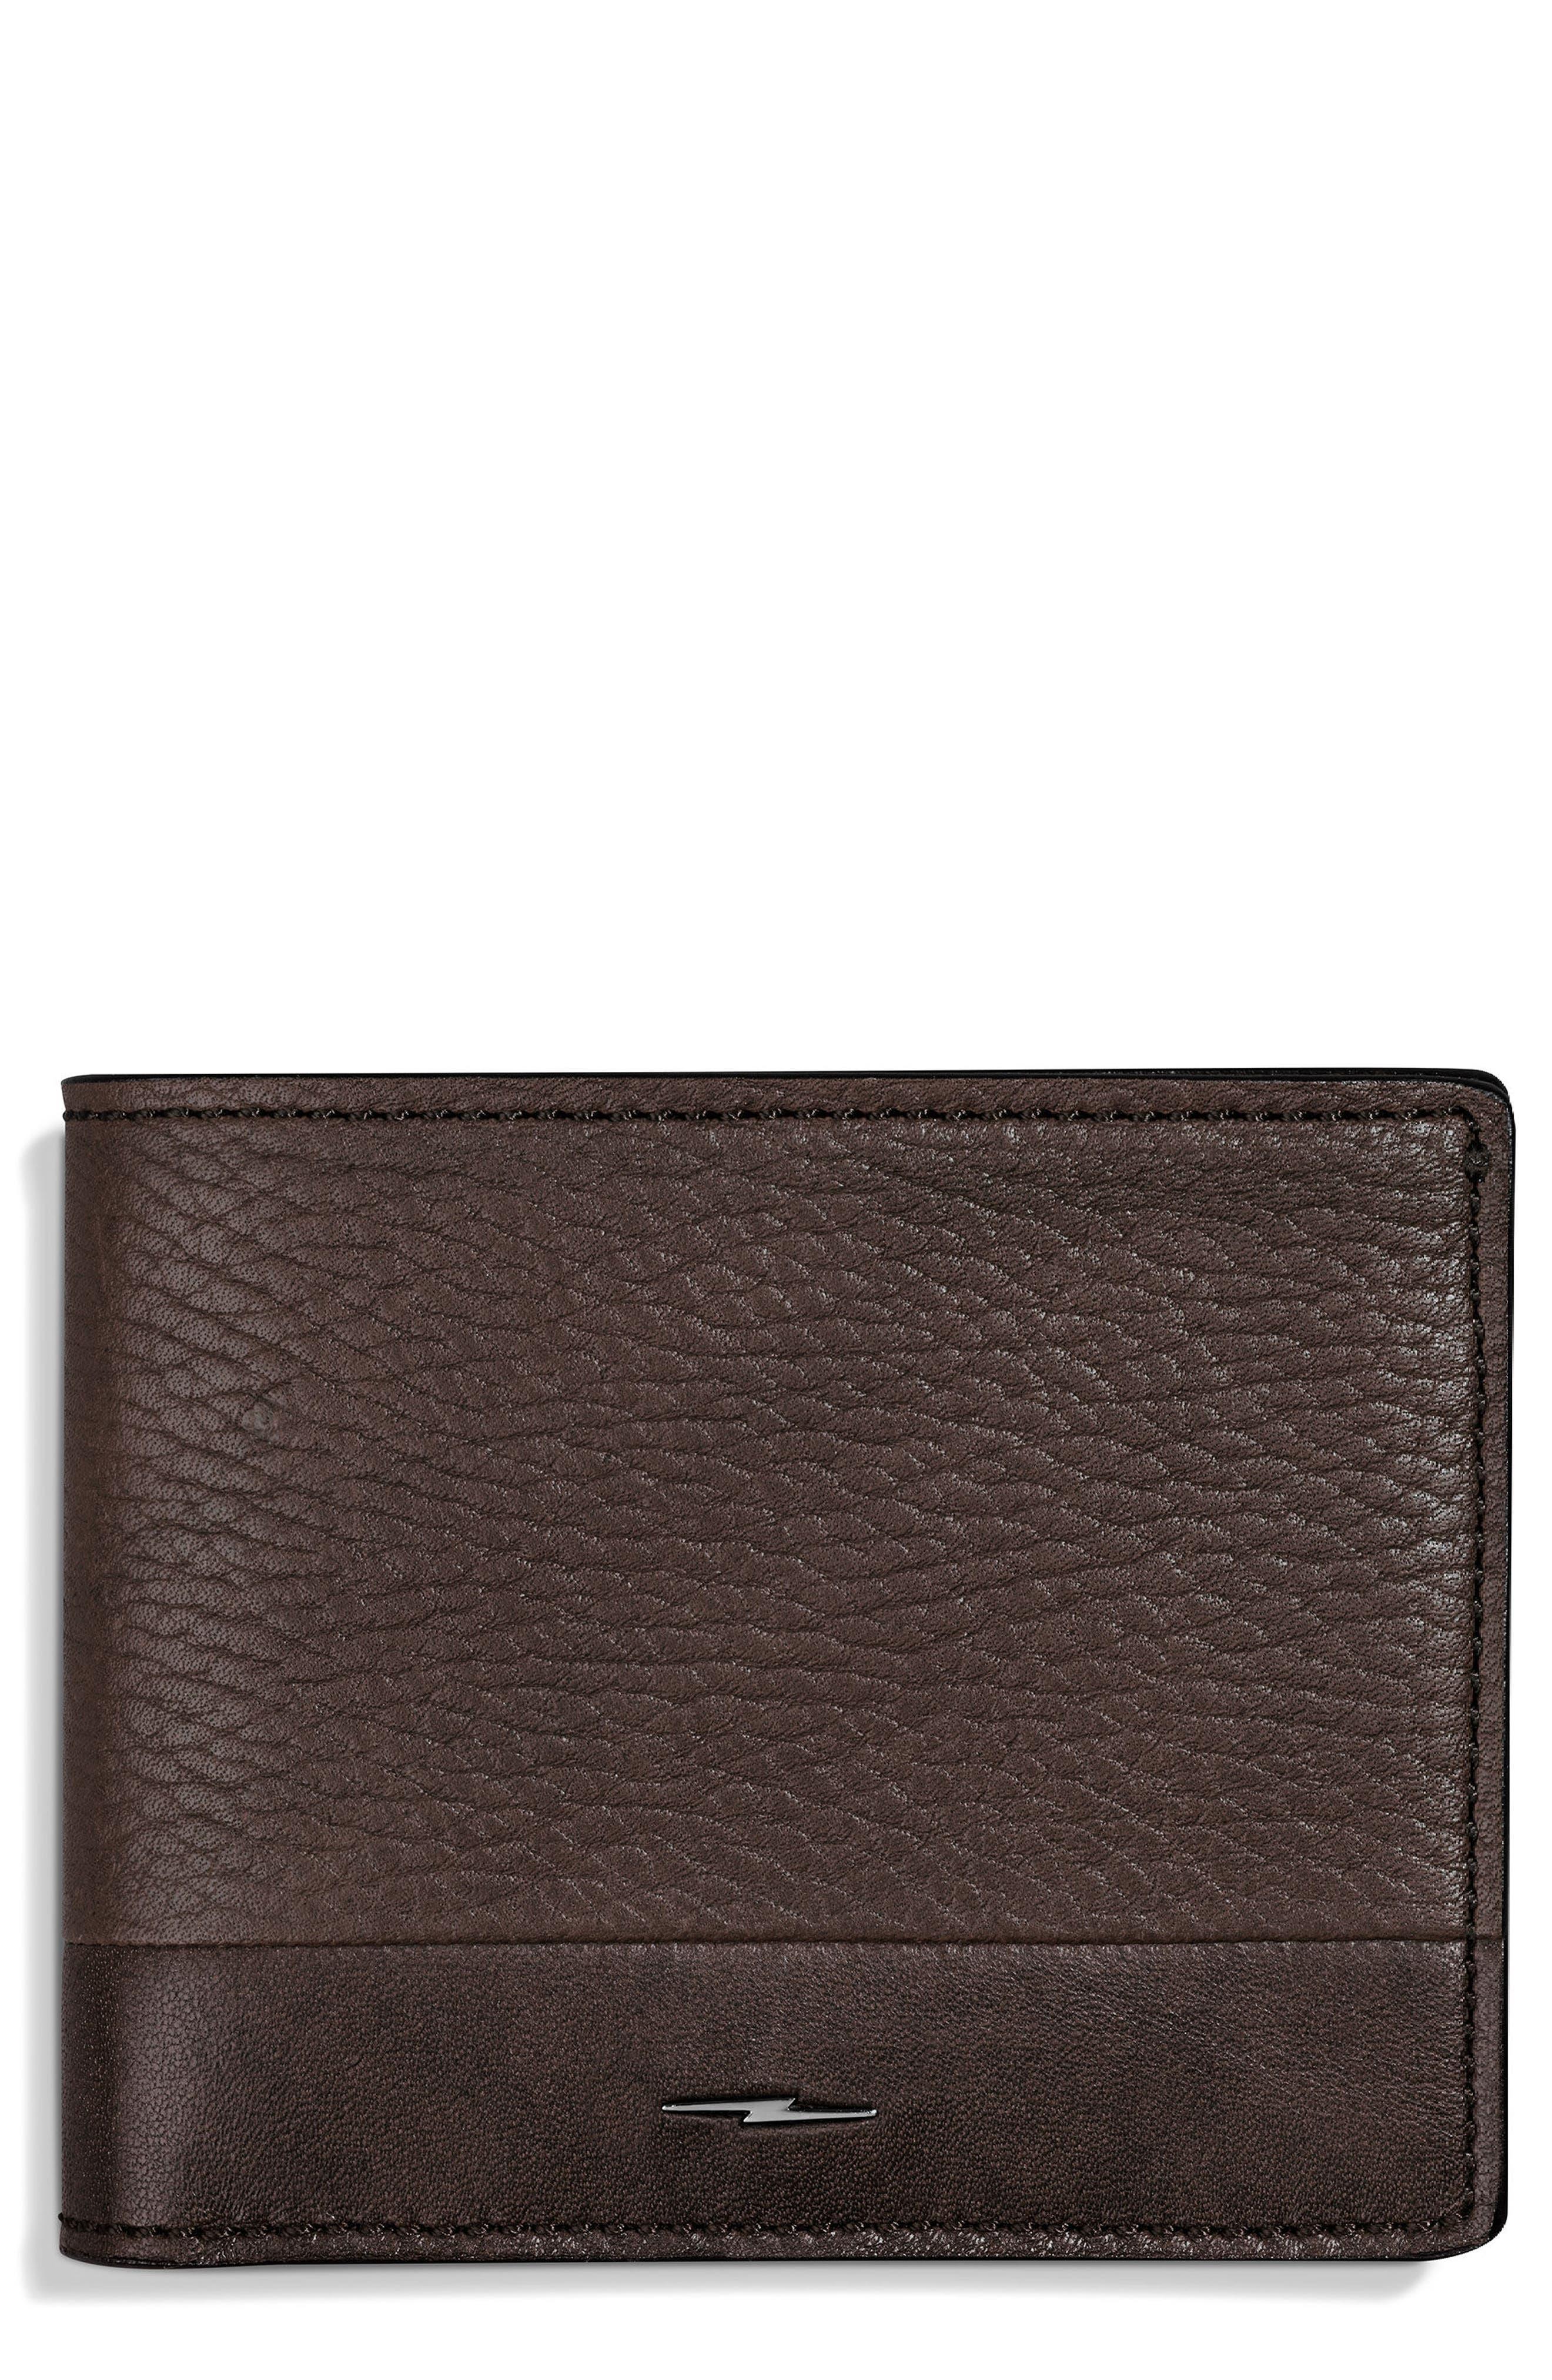 Shinola Bolt Leather Wallet